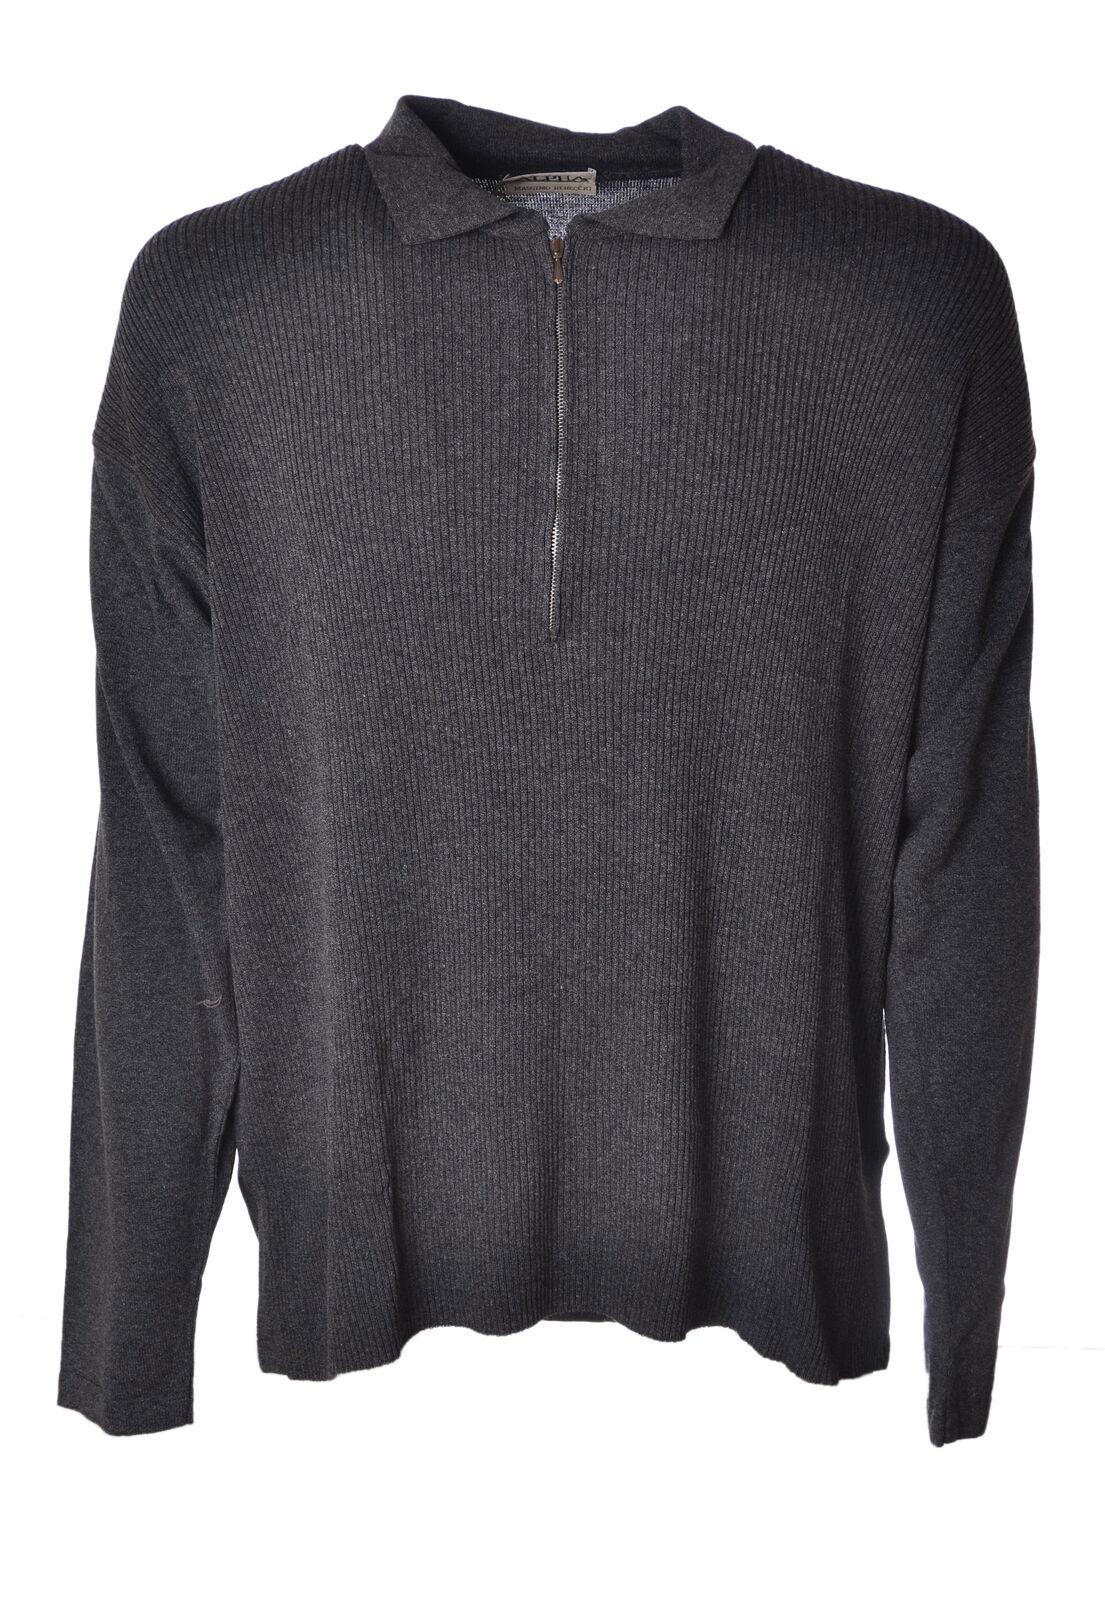 Alpha  -  Sweaters - Male - Grey - 4626722A180056